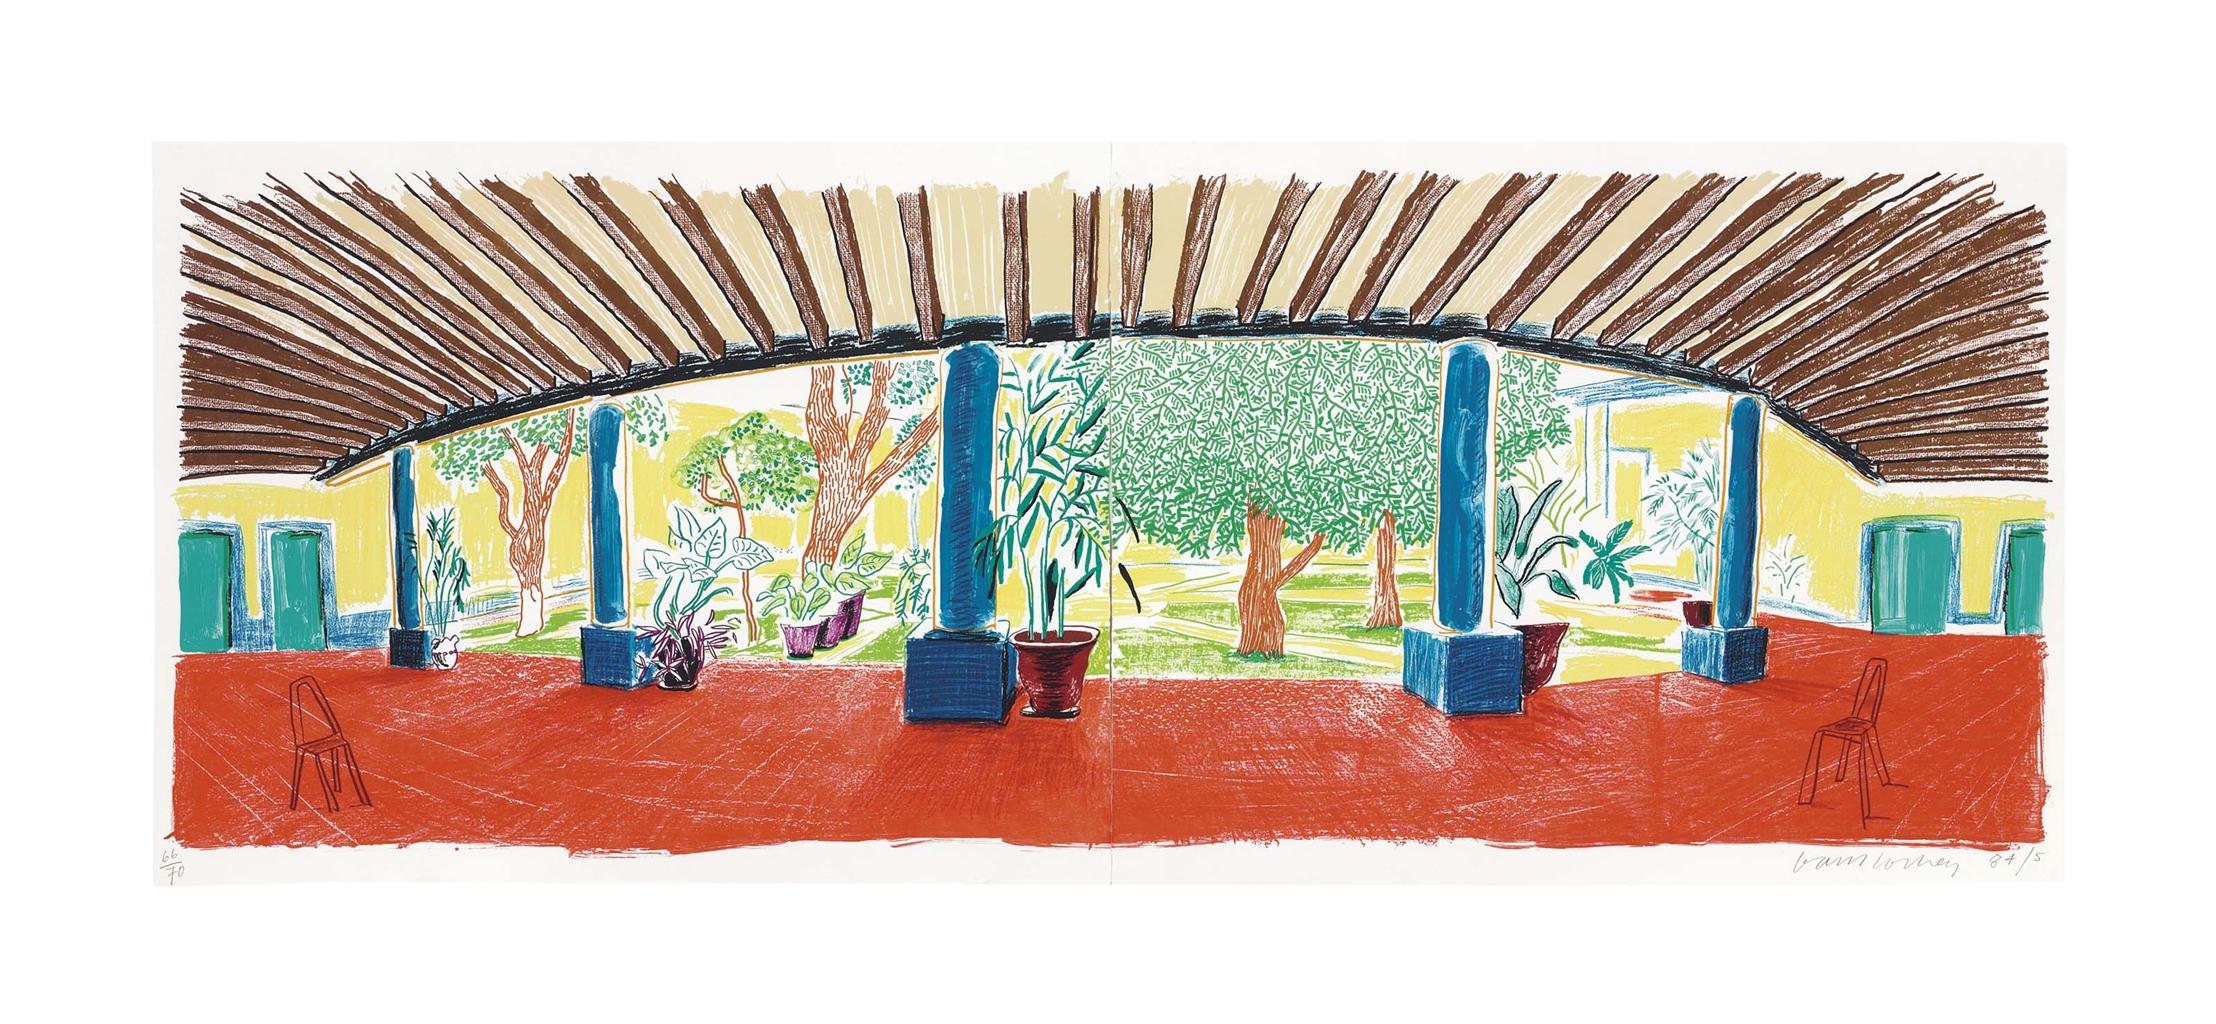 David Hockney-Hotel Acatlan: First Day, From Moving Focus-1985